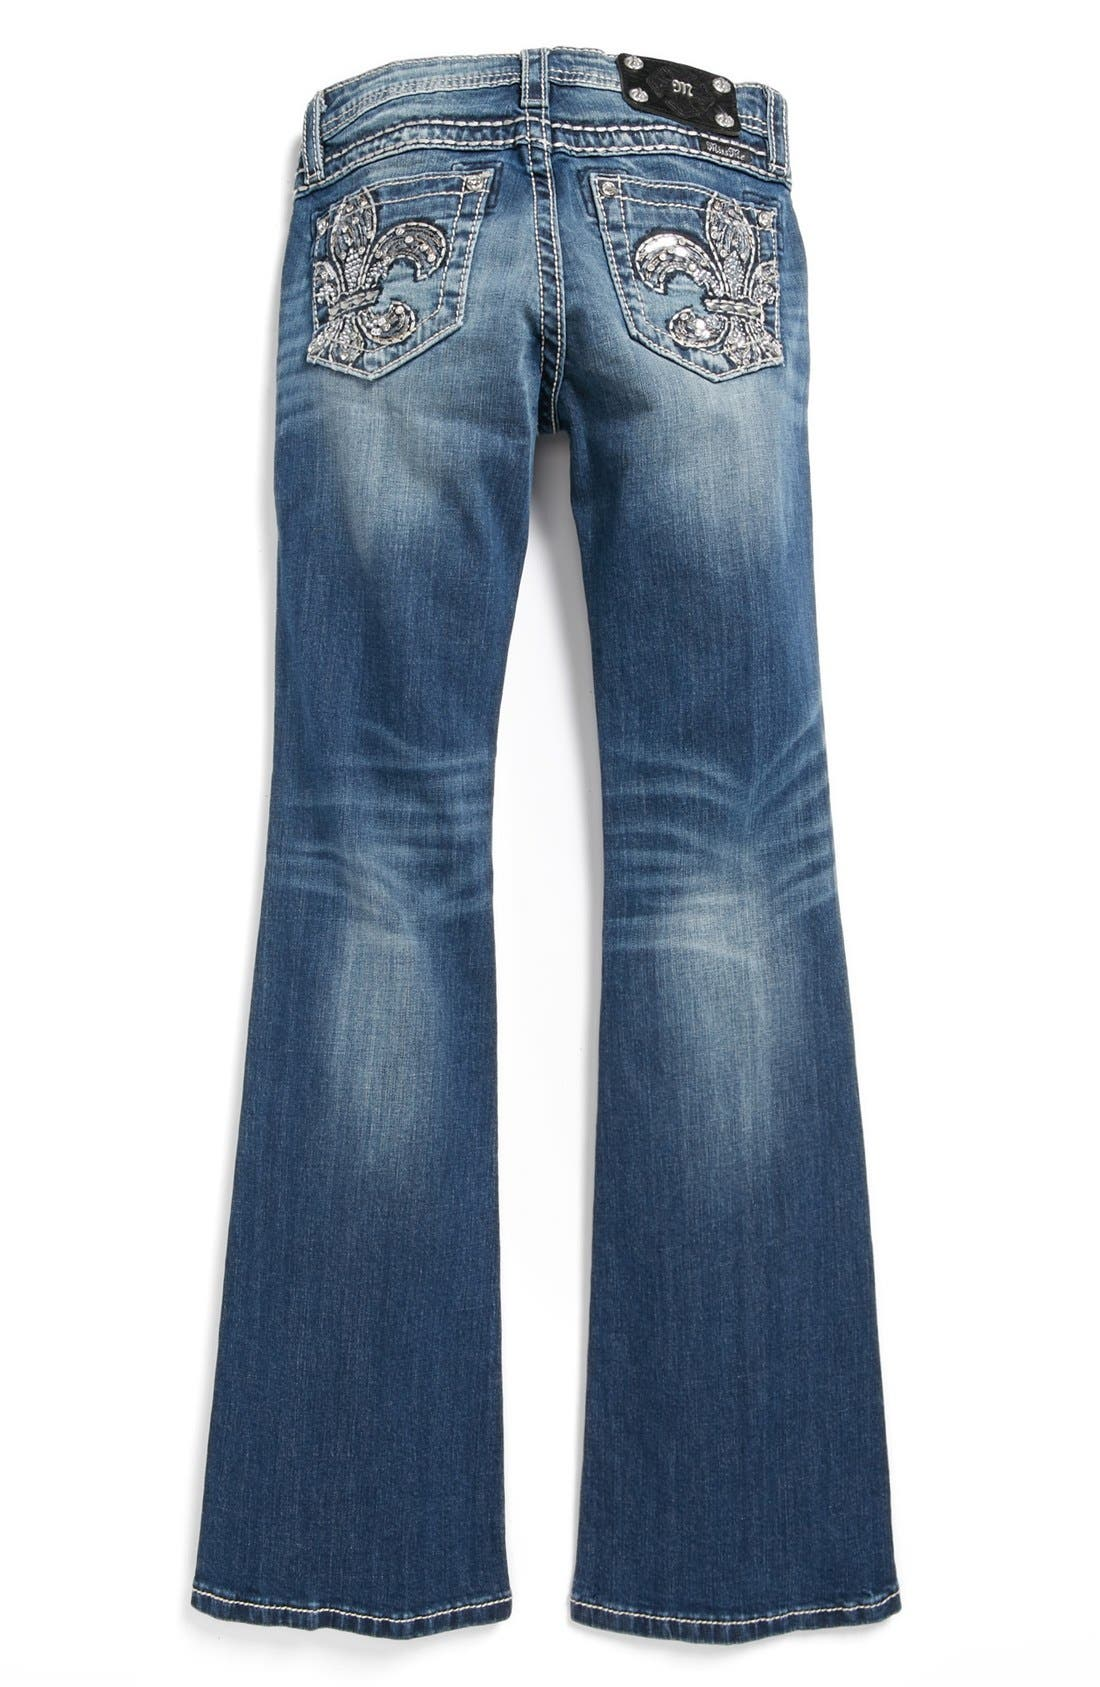 Alternate Image 1 Selected - Miss Me 'Fleur de Lis' Skinny Jeans (Big Girls)